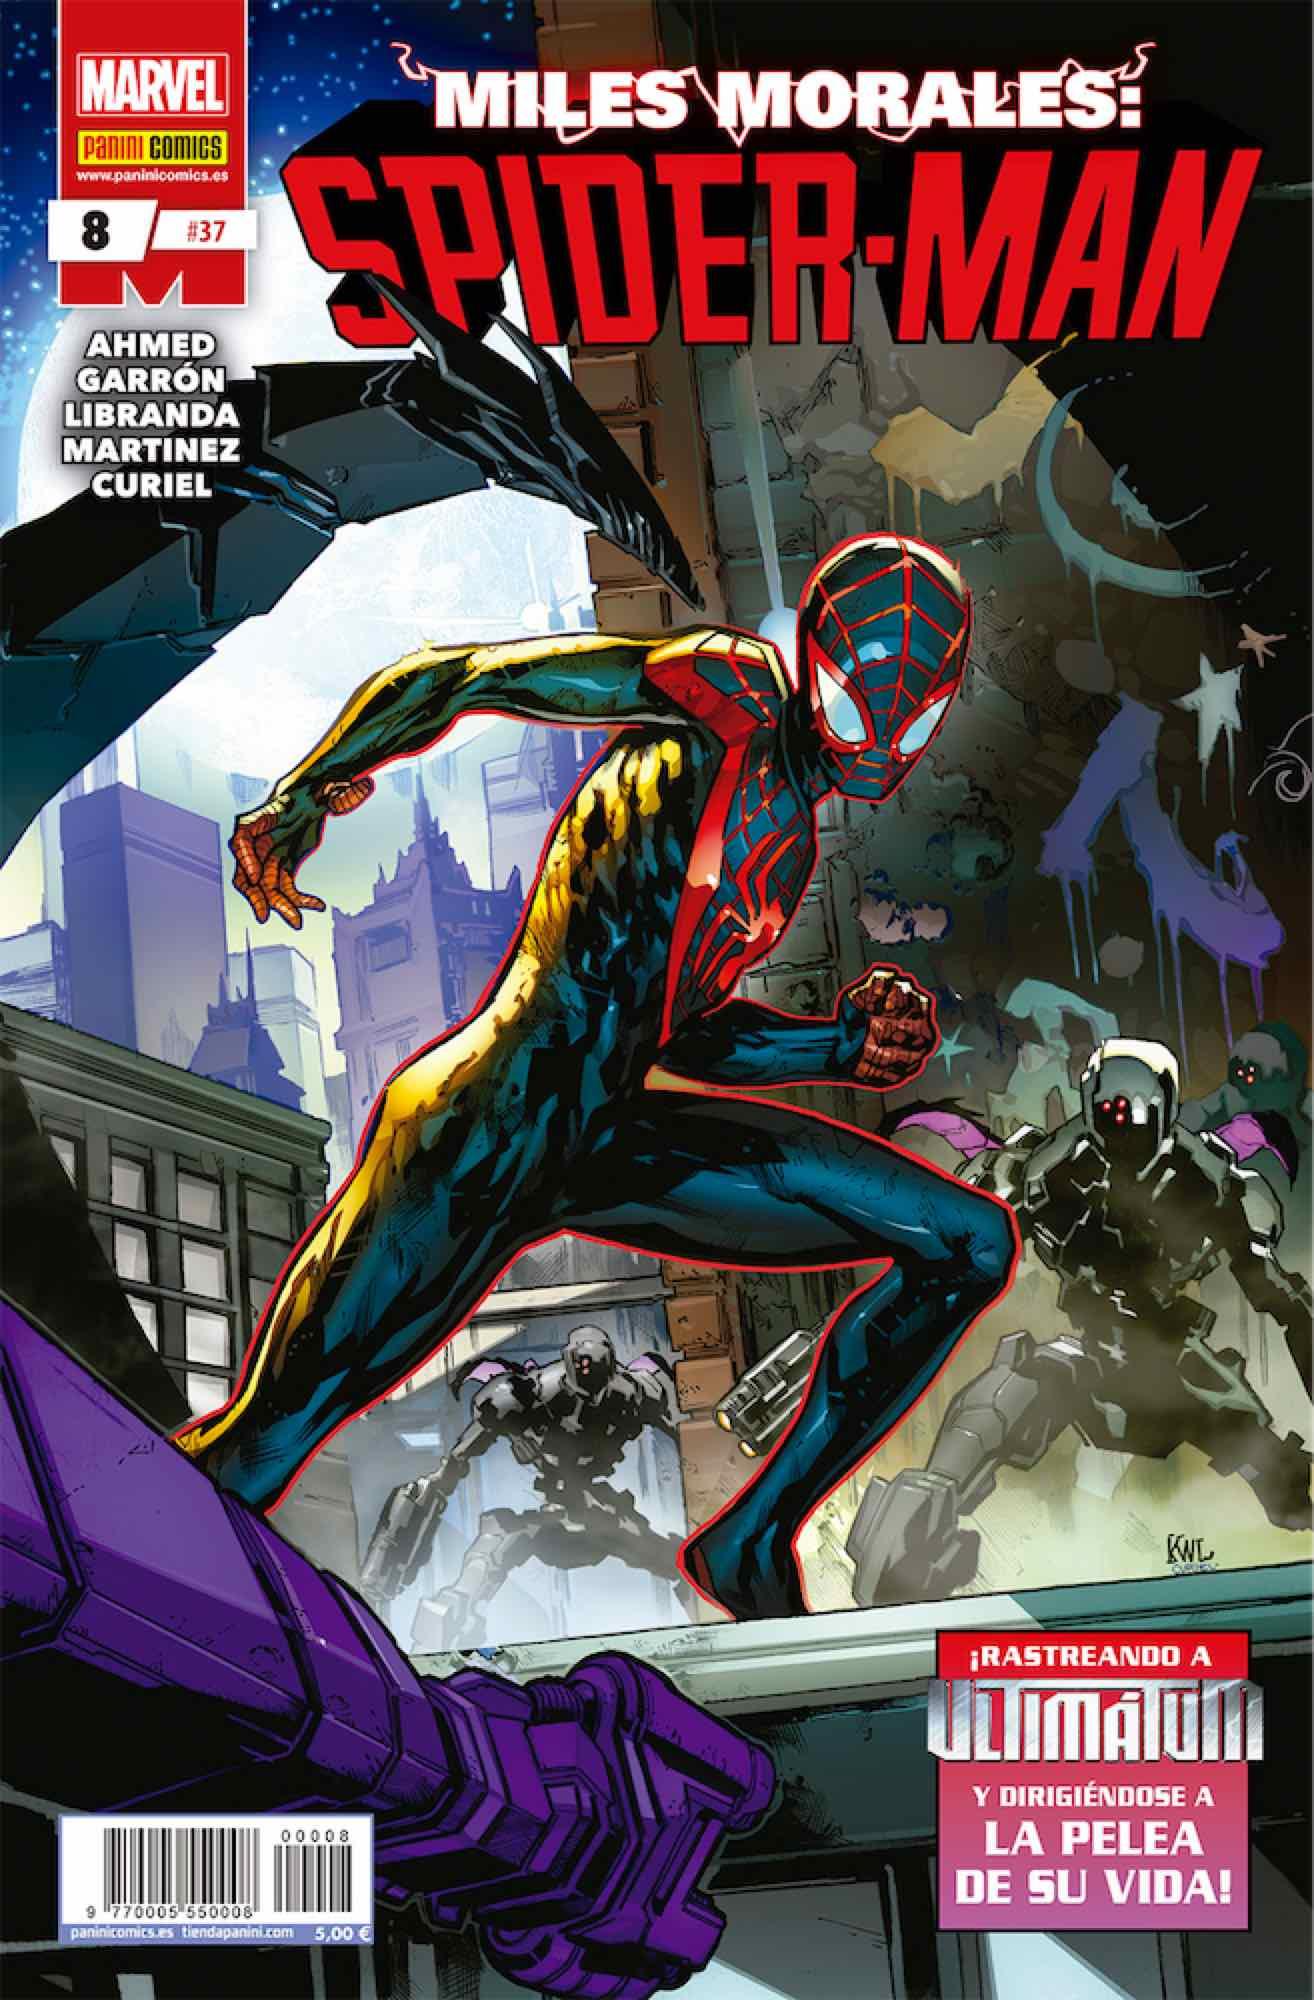 MILES MORALES: SPIDER-MAN 08